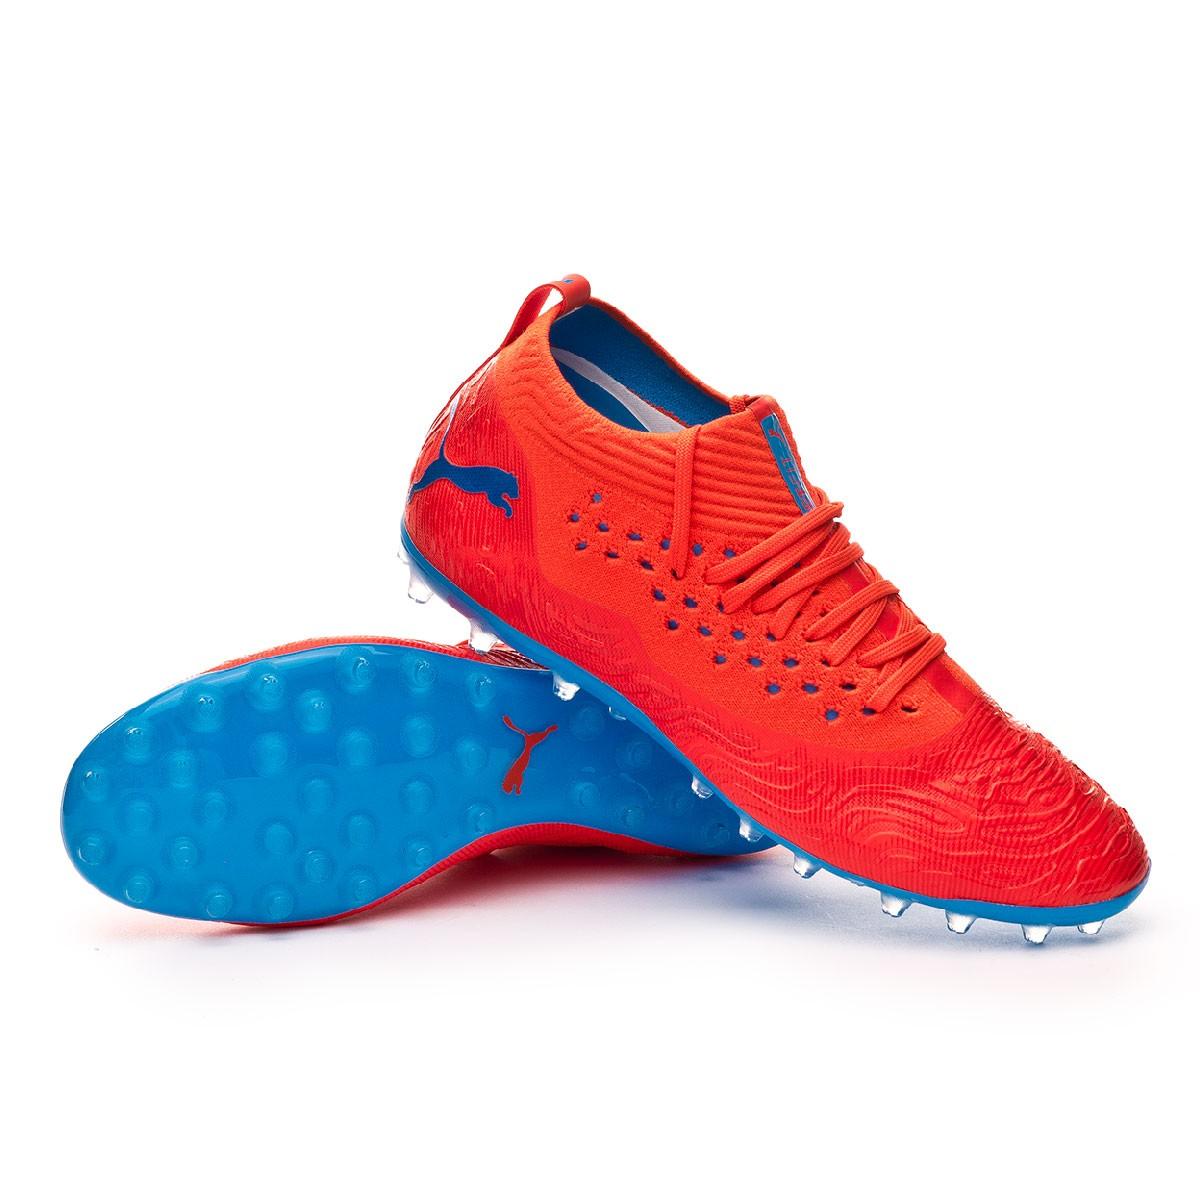 puma foot chaussure